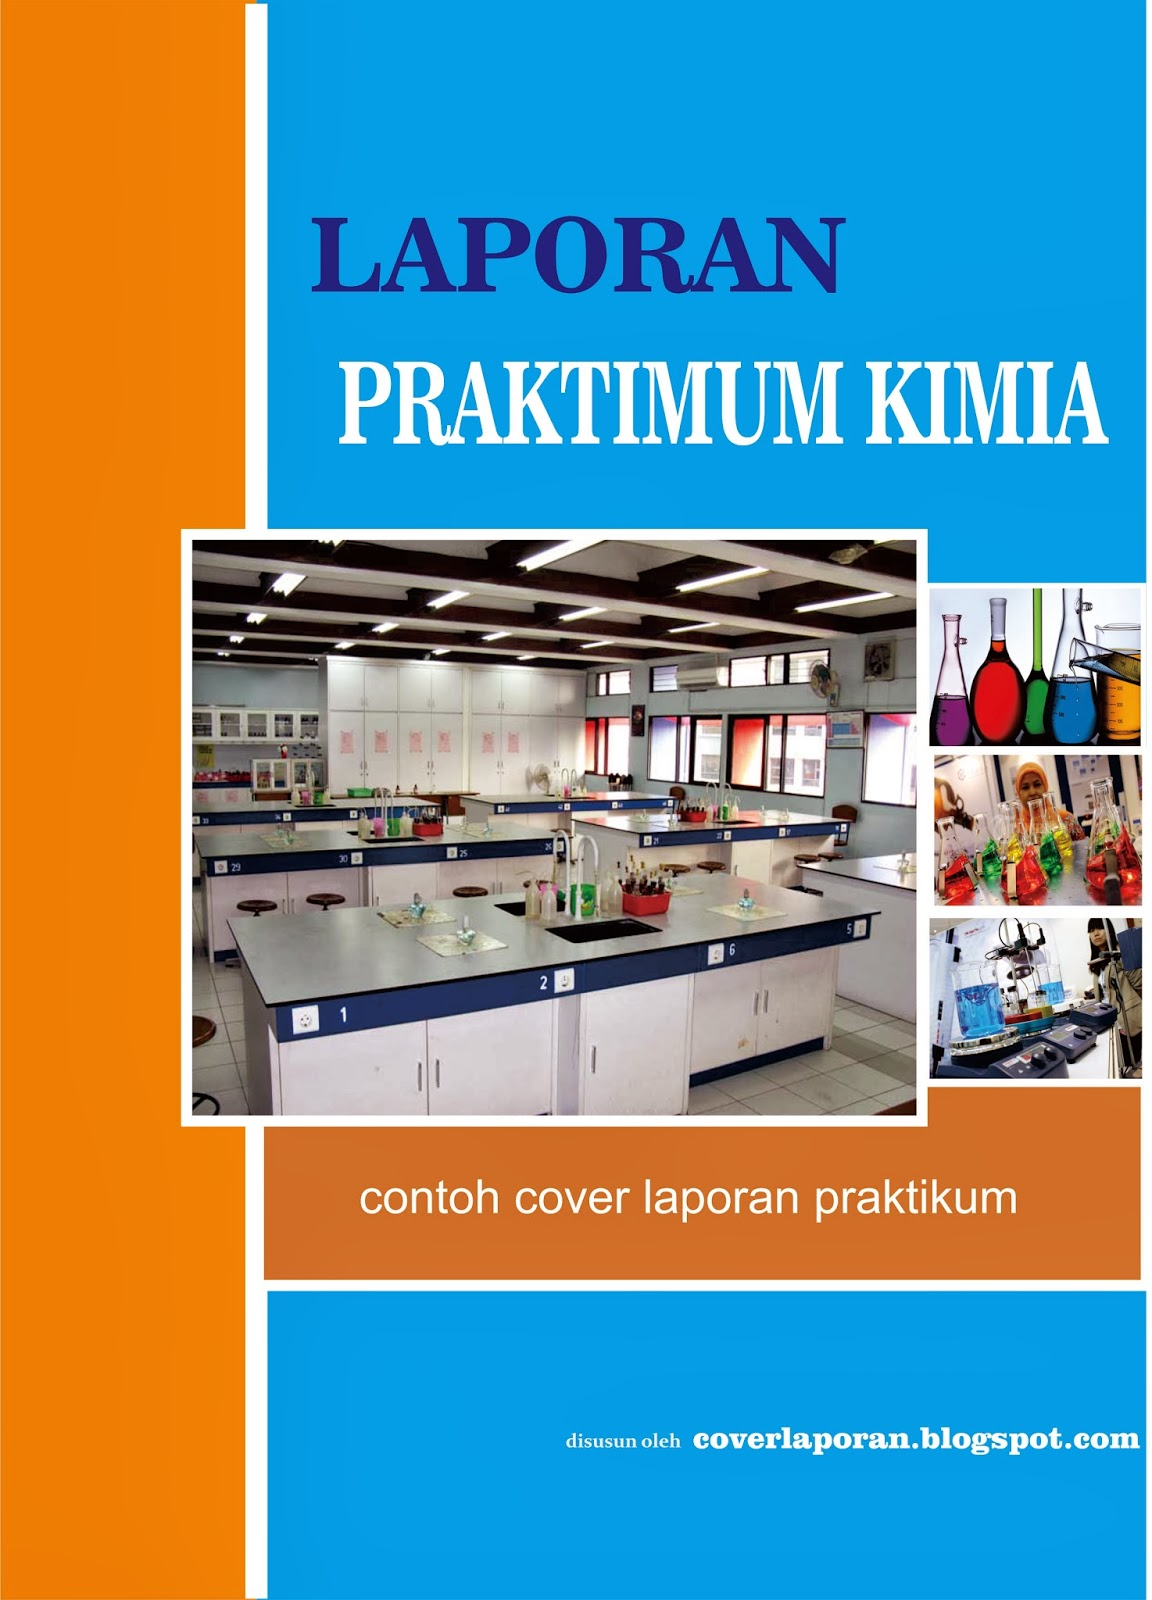 Cover Laporan Praktikum Kimia Download Contoh Cover Laporan